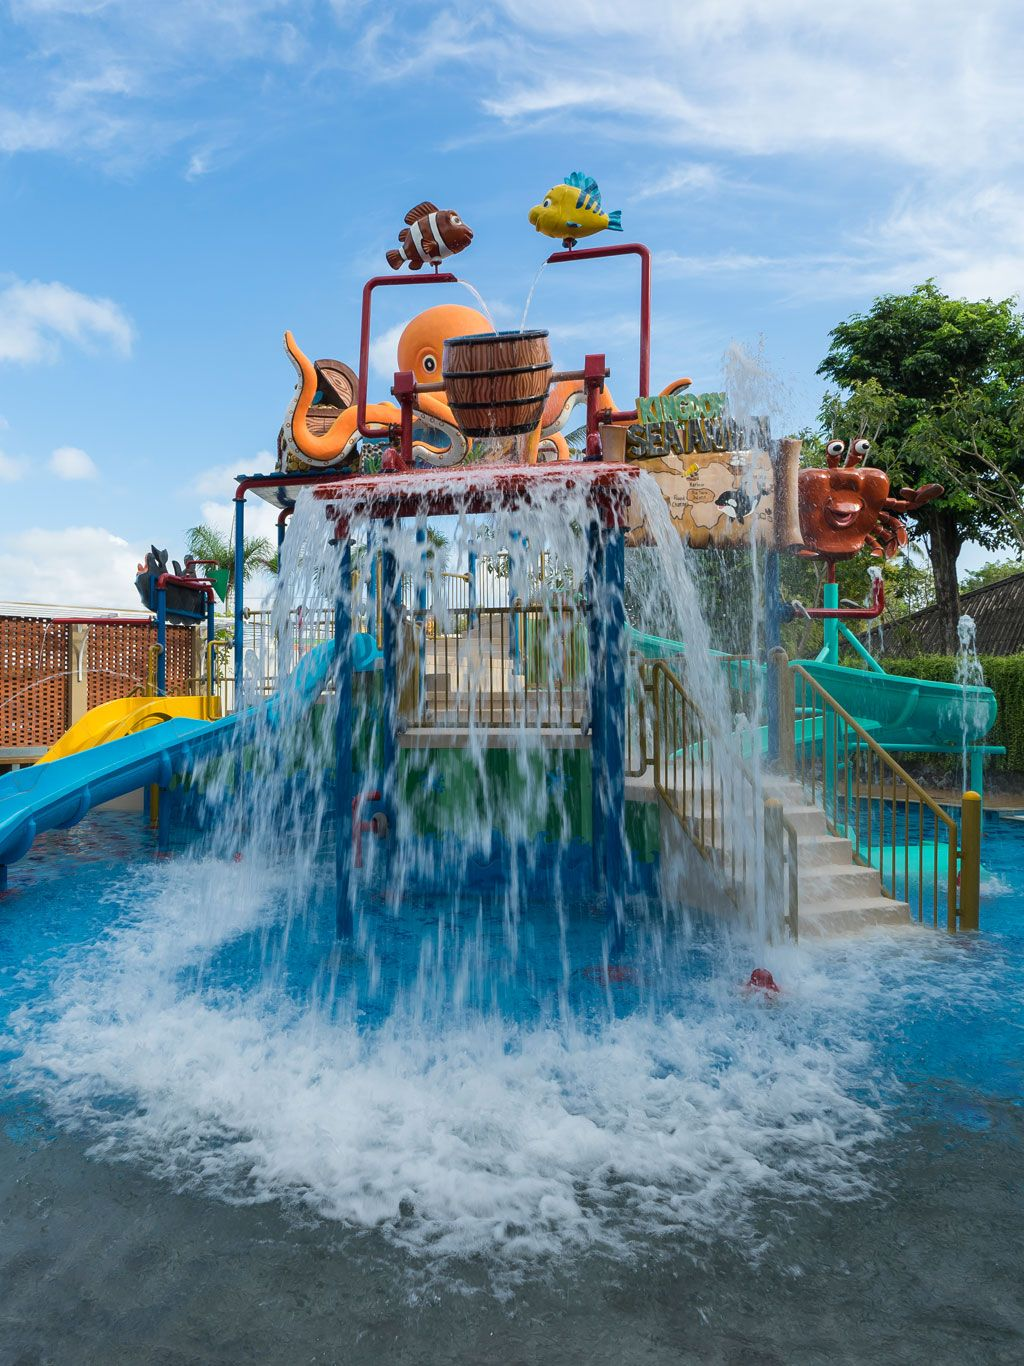 Bali Resort All Inclusive Grand Mirage Beachfront Resorts Paket Watersports Tanjung Benoa Include Lunch Mini Waterpark